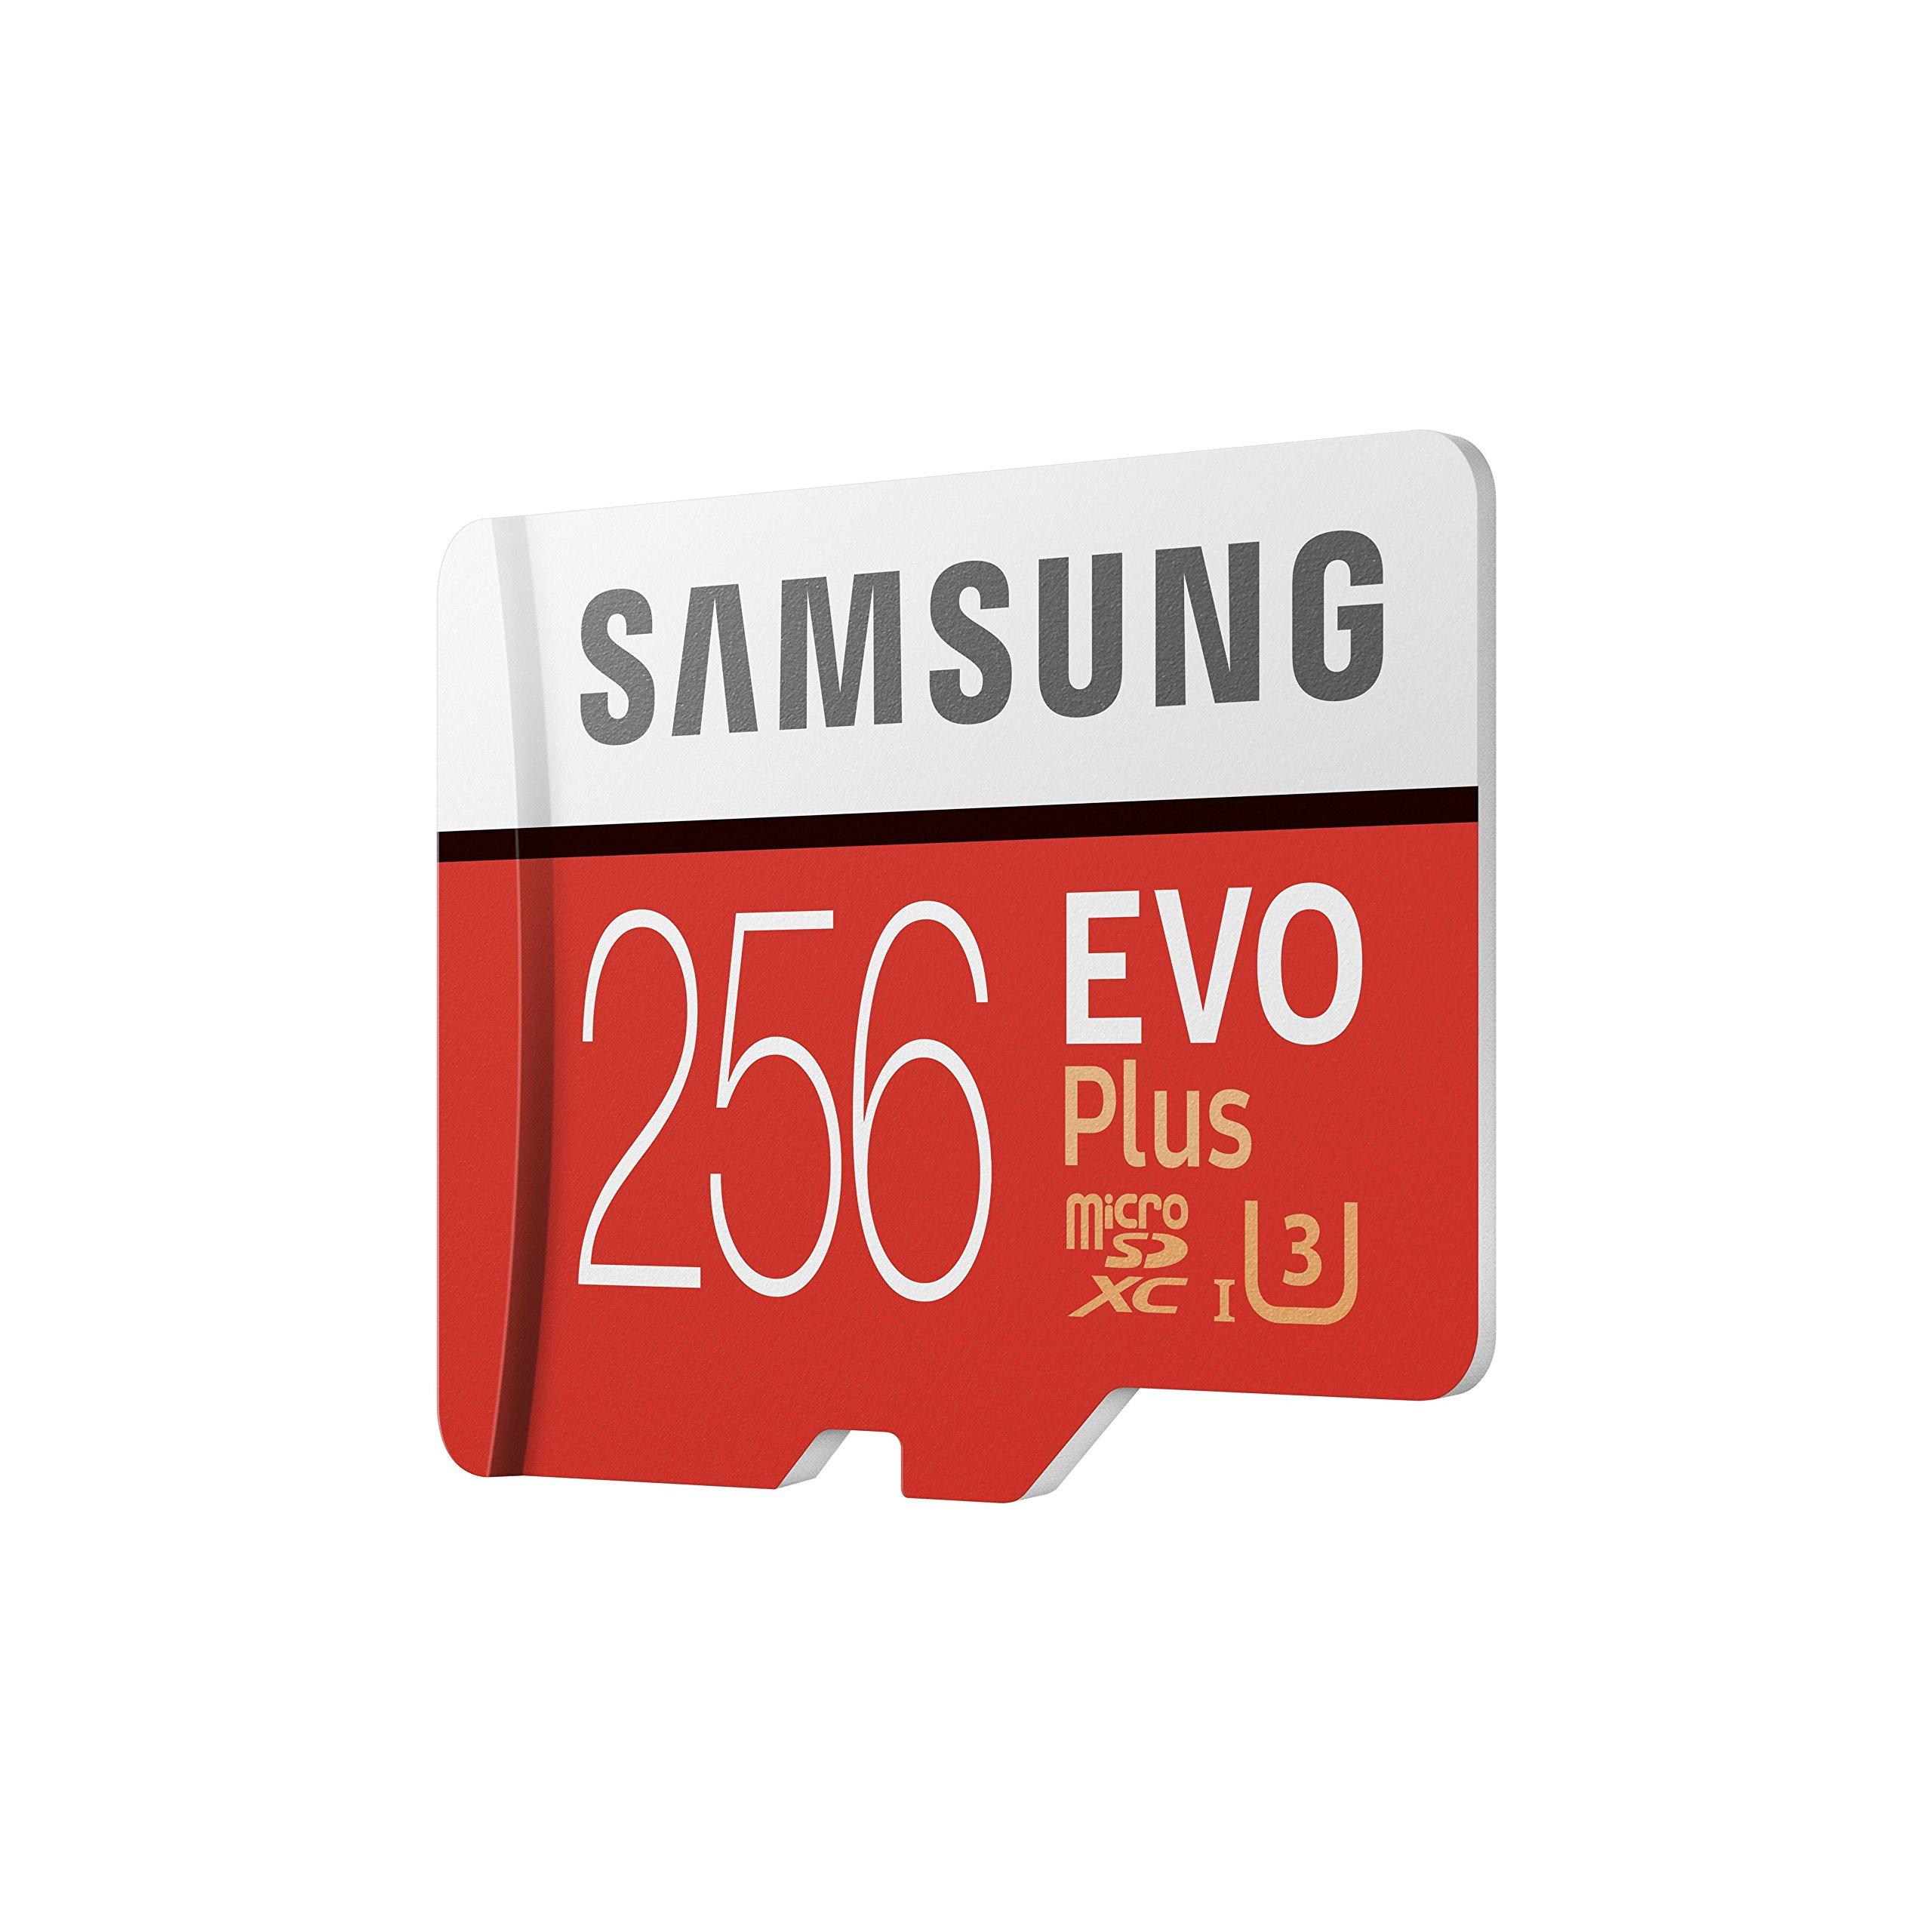 Samsung 256GB EVO Plus Class 10 UHS-I microSDXC U3 with Adapter (MB-MC256GA) by Samsung (Image #5)